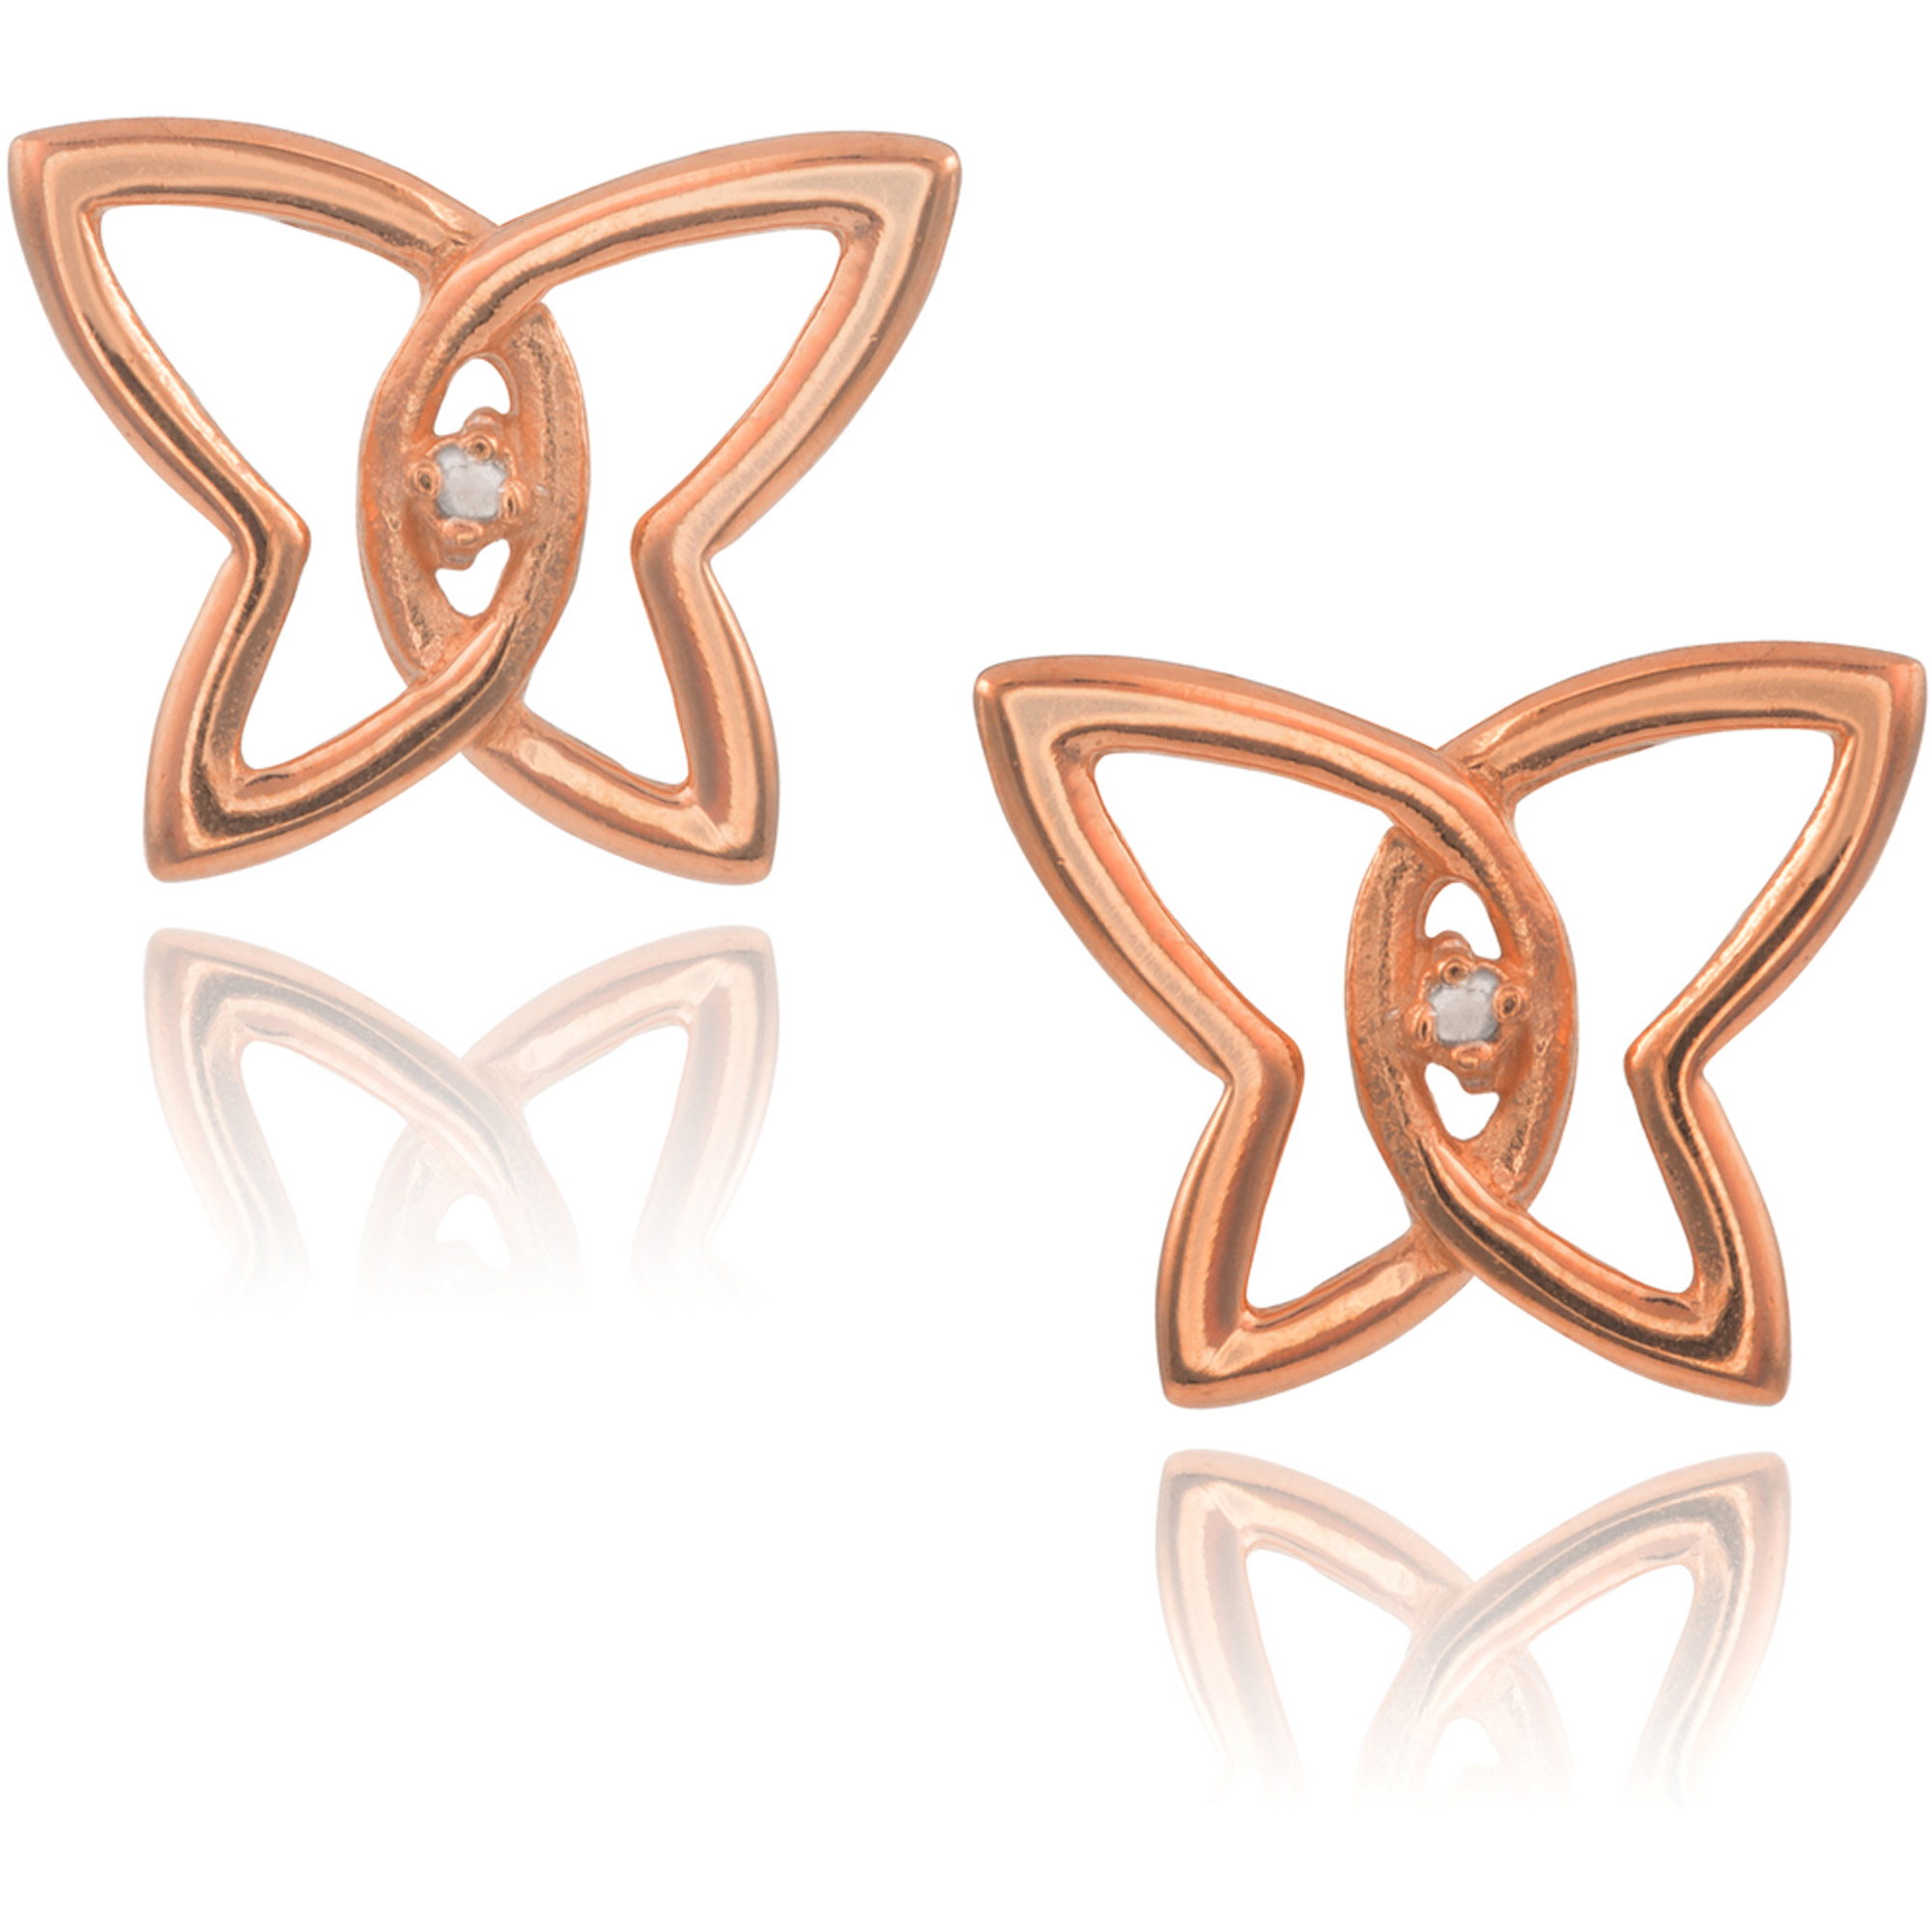 Brinley Co. Women's 0.02 Carat T.W. Diamond Accent Sterling Silver Butterfly Stud Earrings, Rose Gold